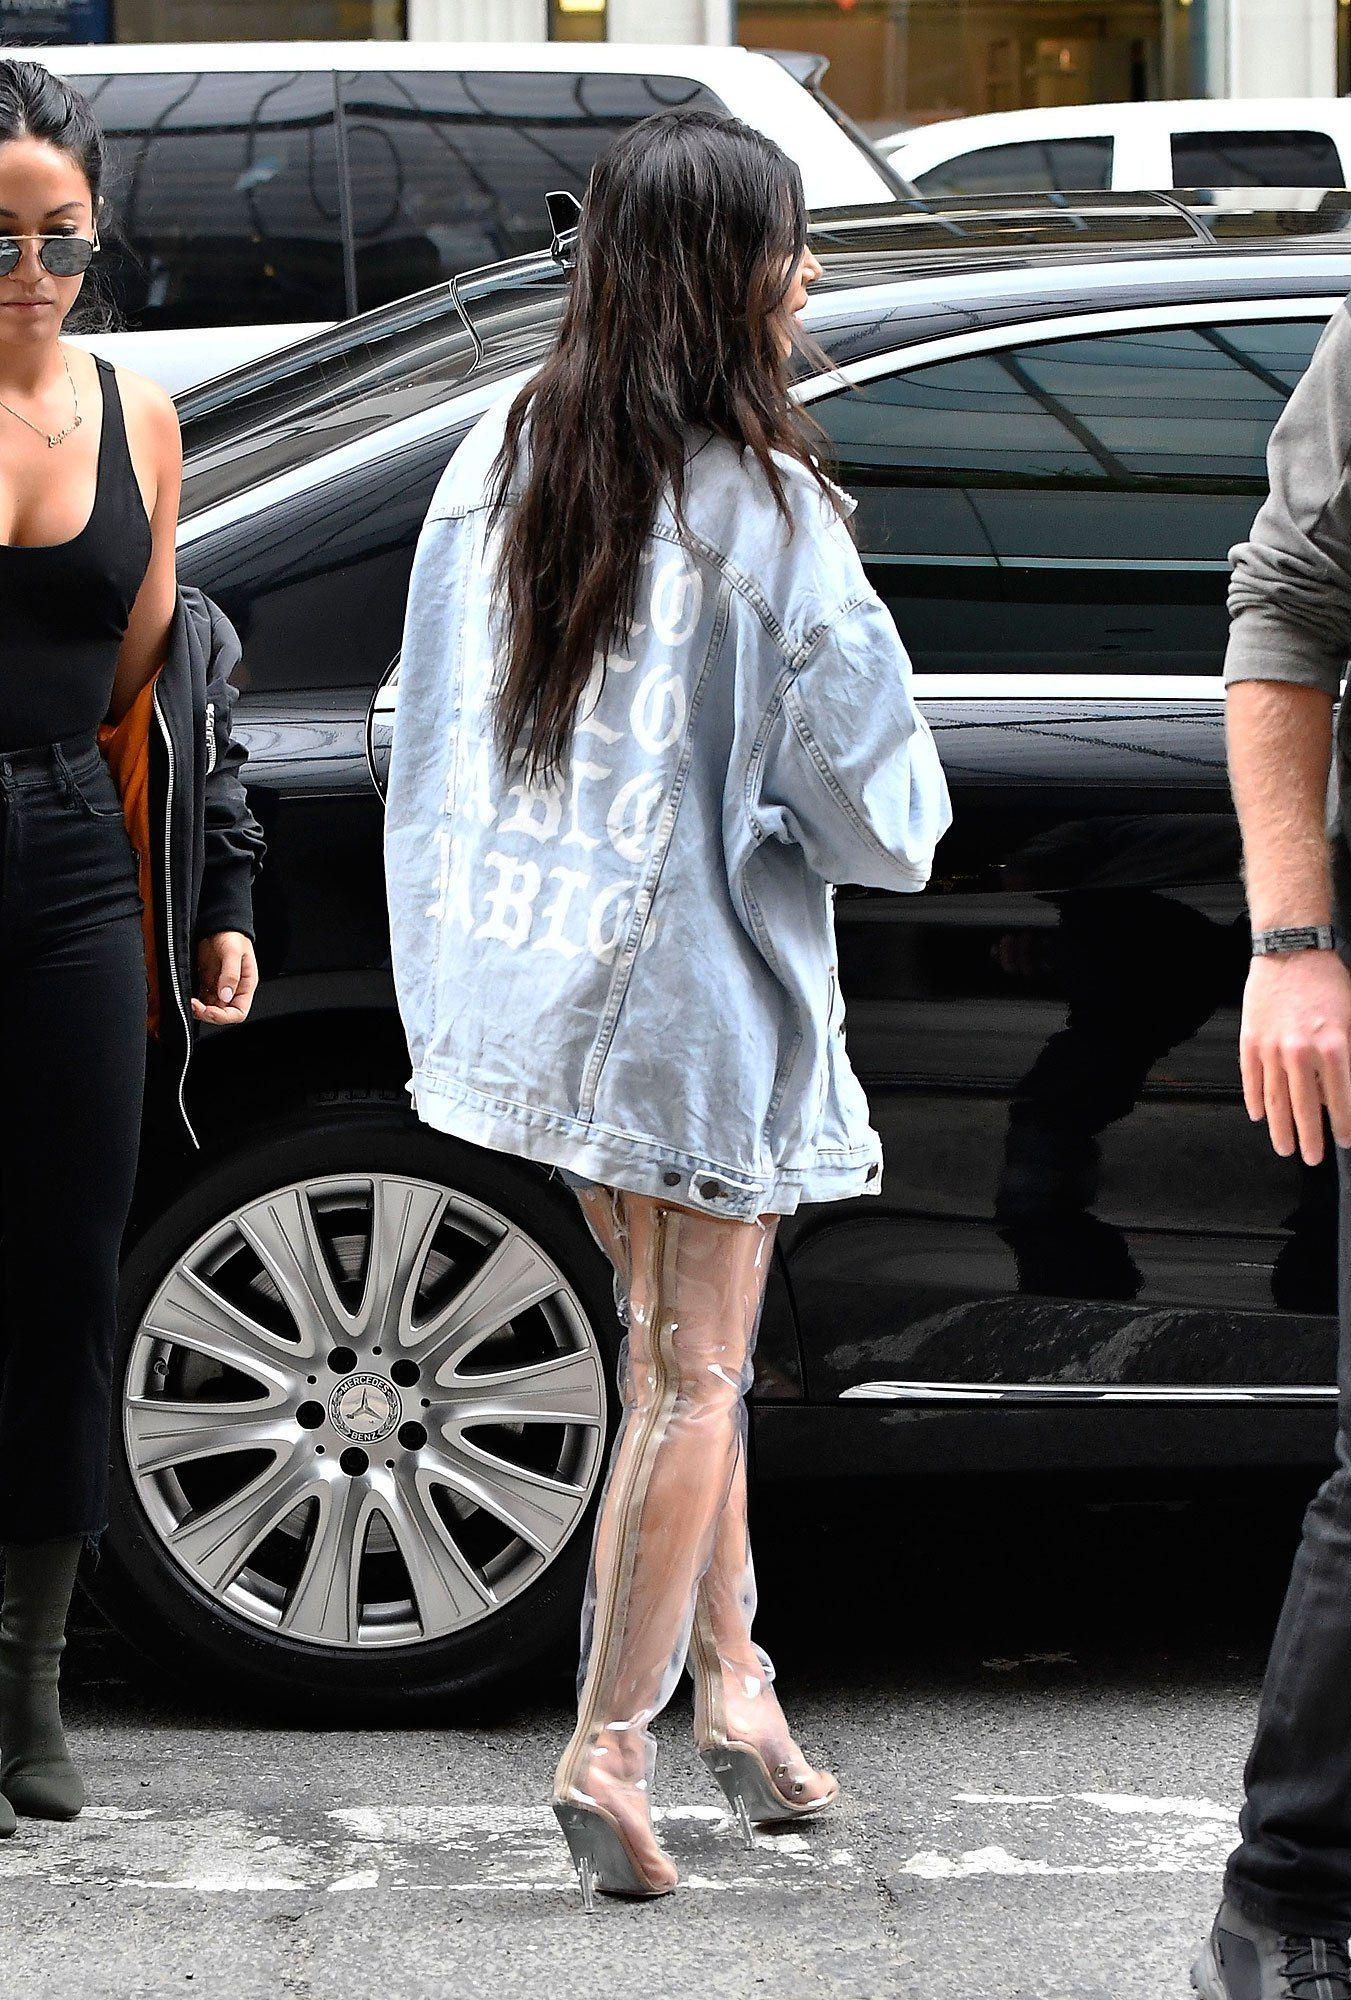 Kim Kardashian Reinvents the Rain Boot with Clear Thigh High Heels in N Y C